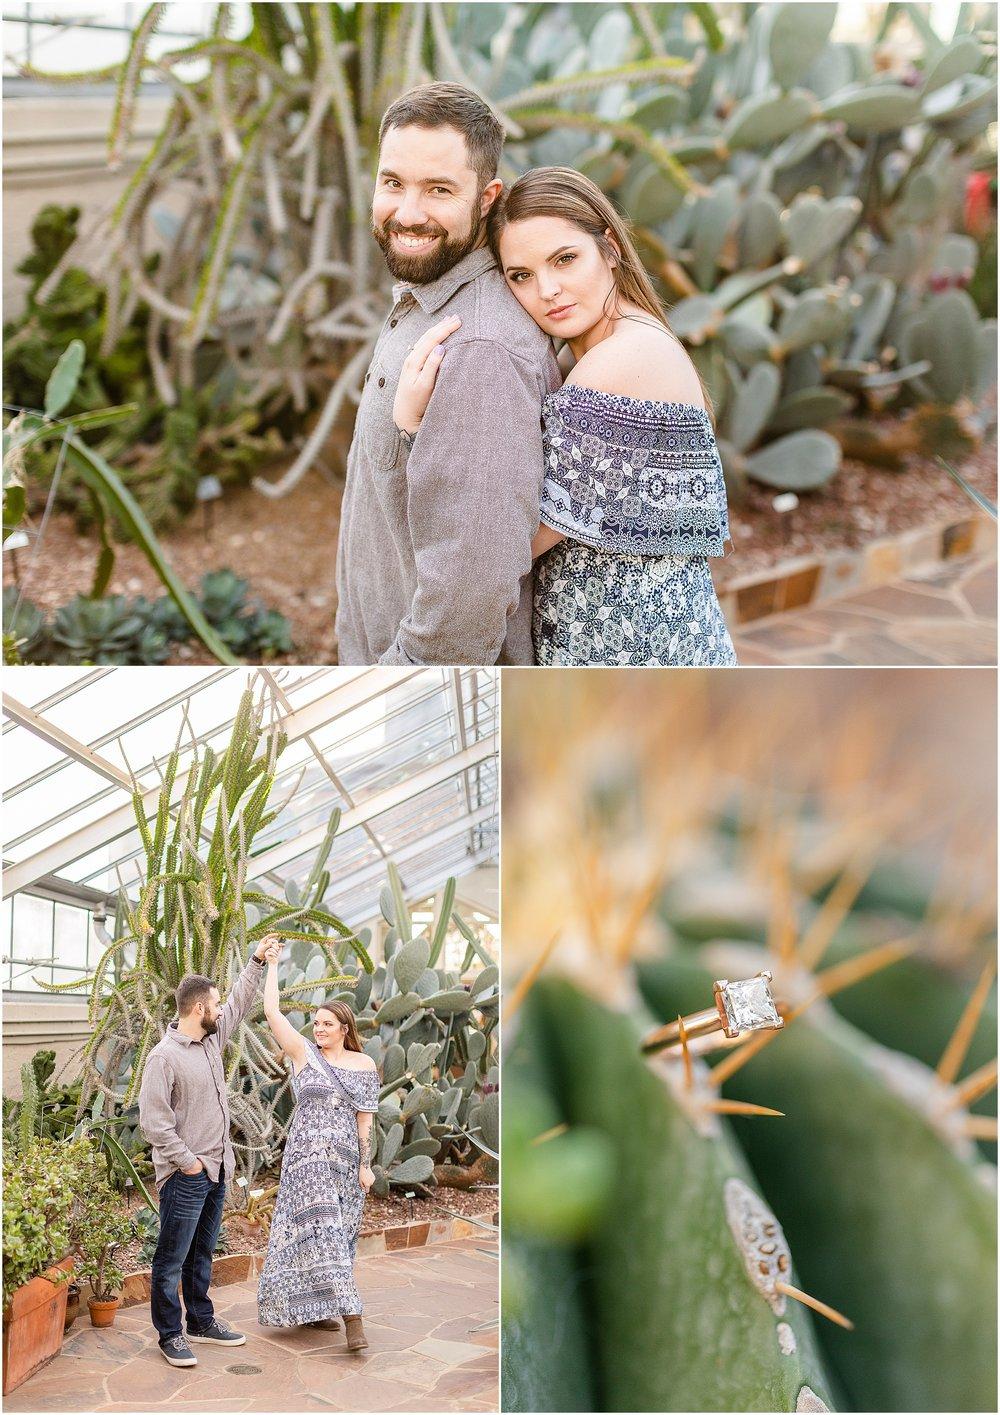 Rawlings-Conservatory-Engagement-Photos_0292.jpg